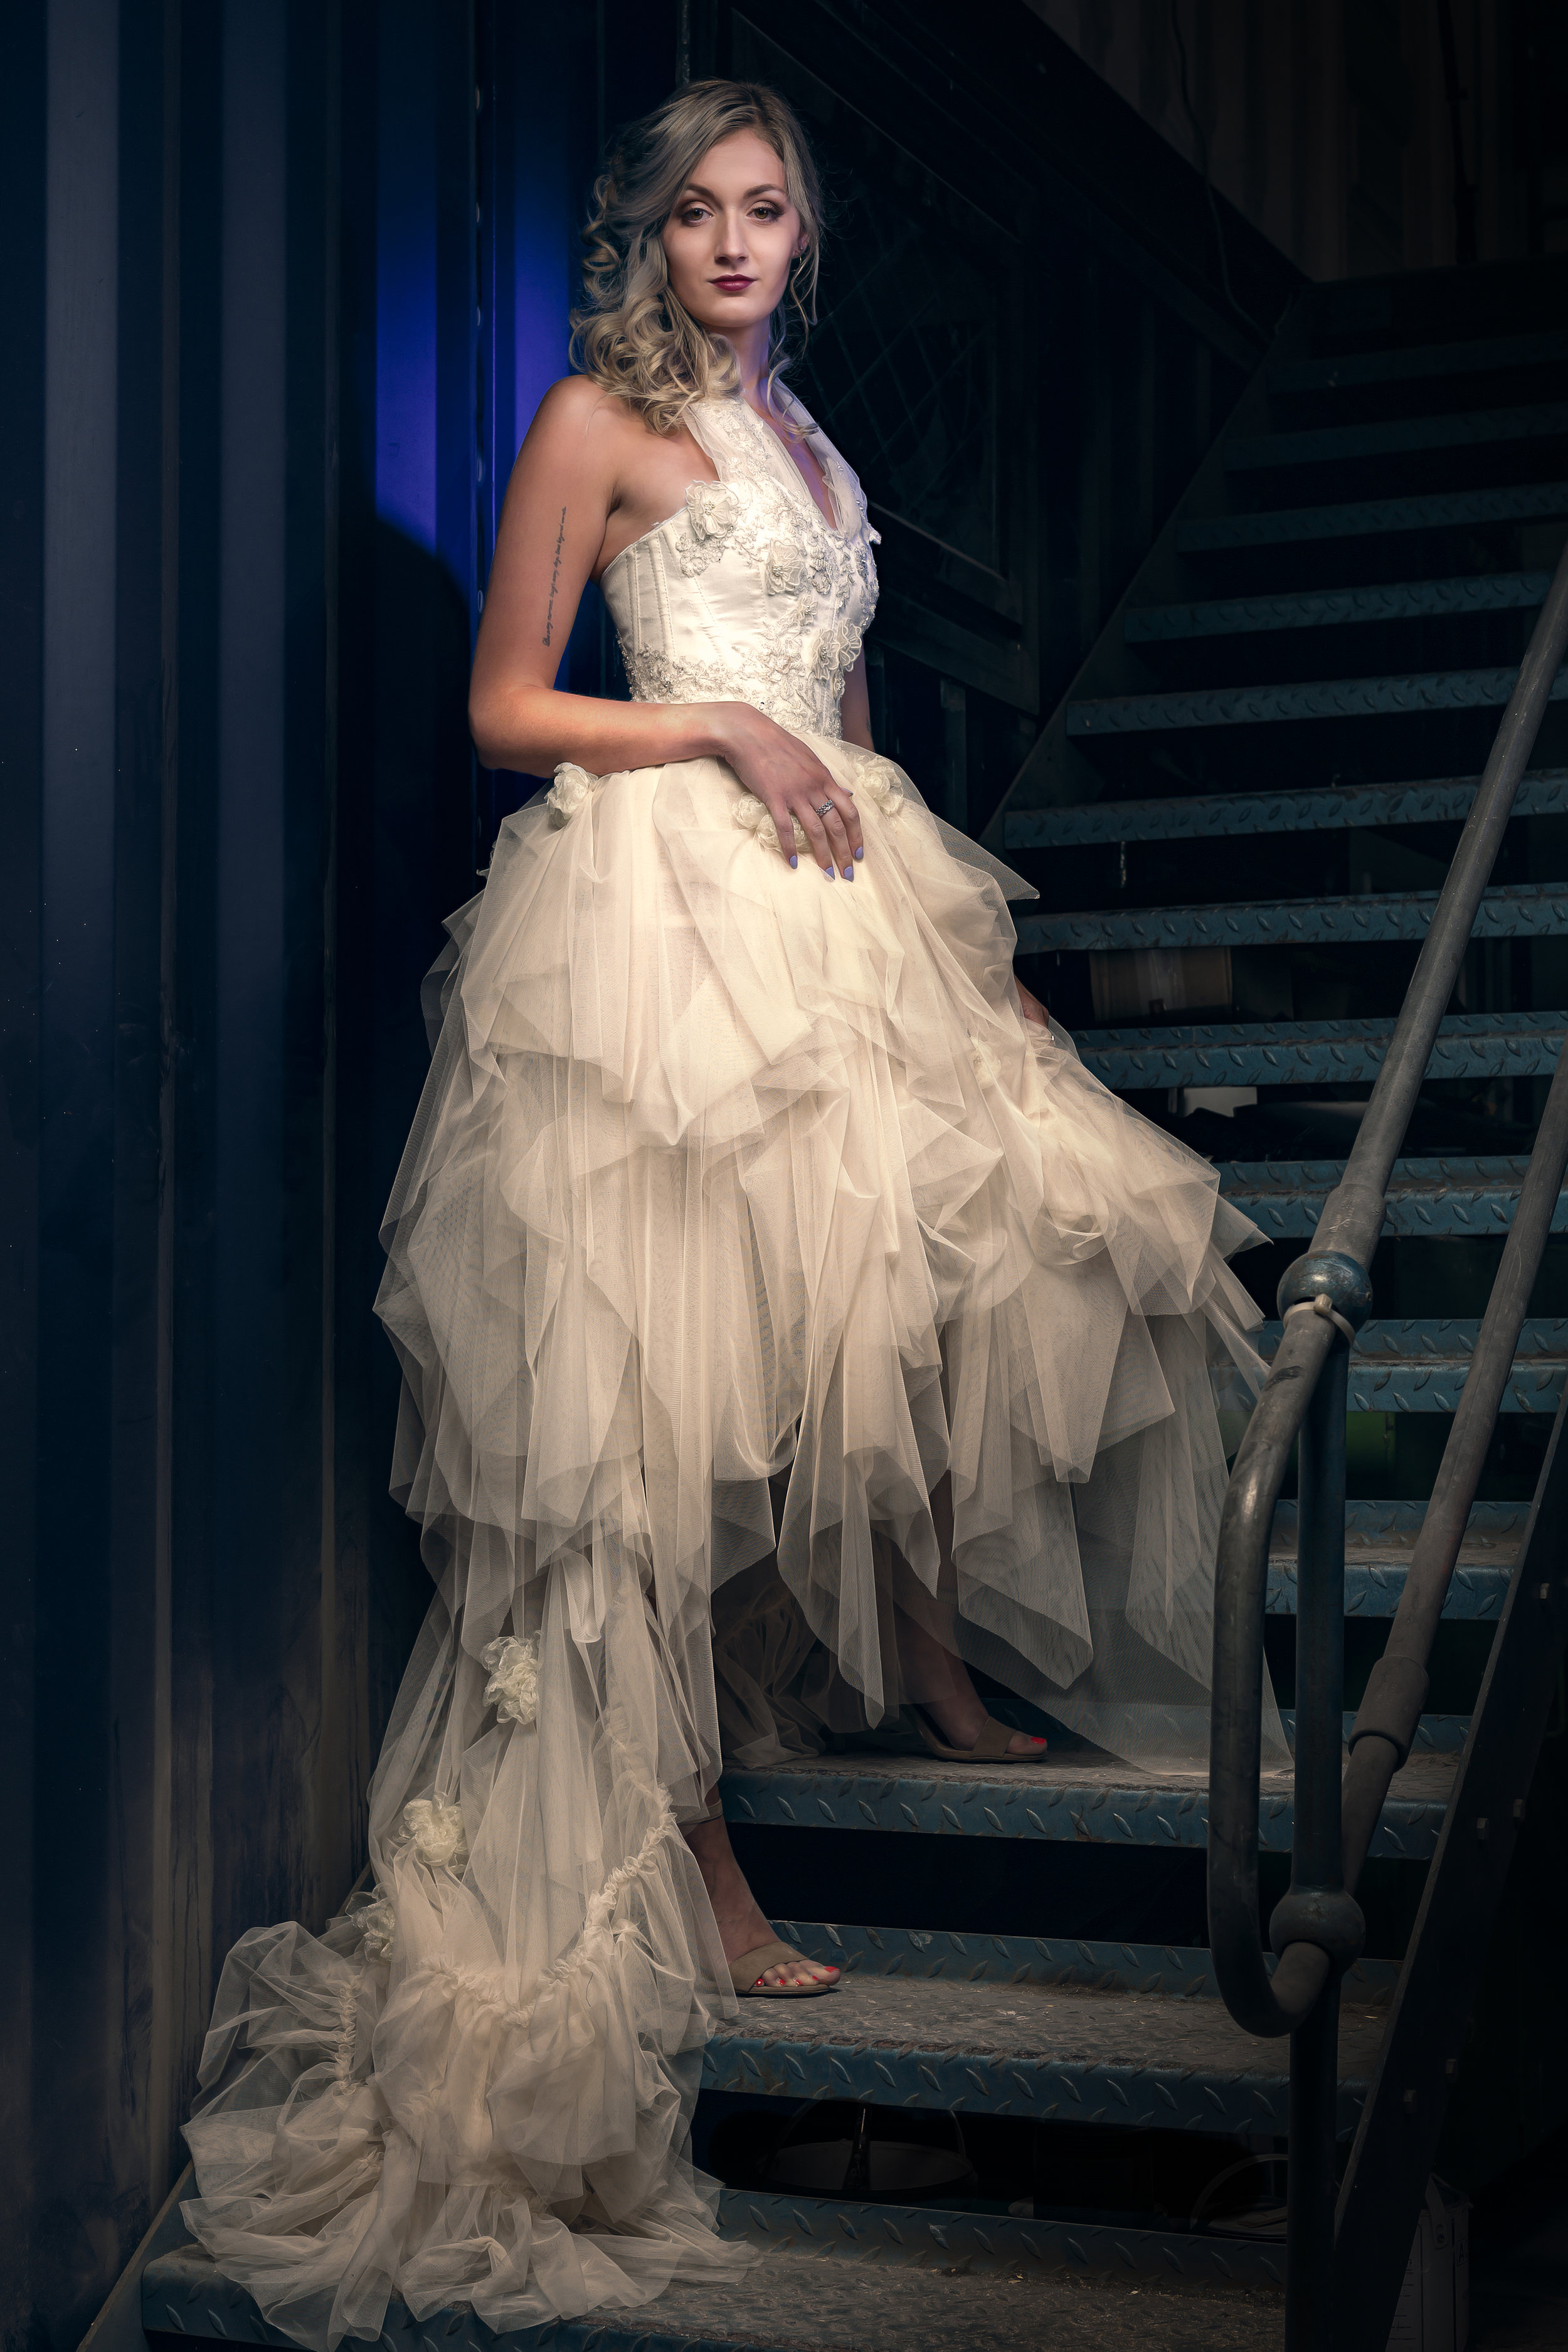 Martin Dobson Couture - Bespoke wedding dress - Suffolk - 0205 - September 17, 2017 - copyright Foyers Photography-Edit--® Robert Foyers - All Rights Reserved-3840 x 5760.JPG